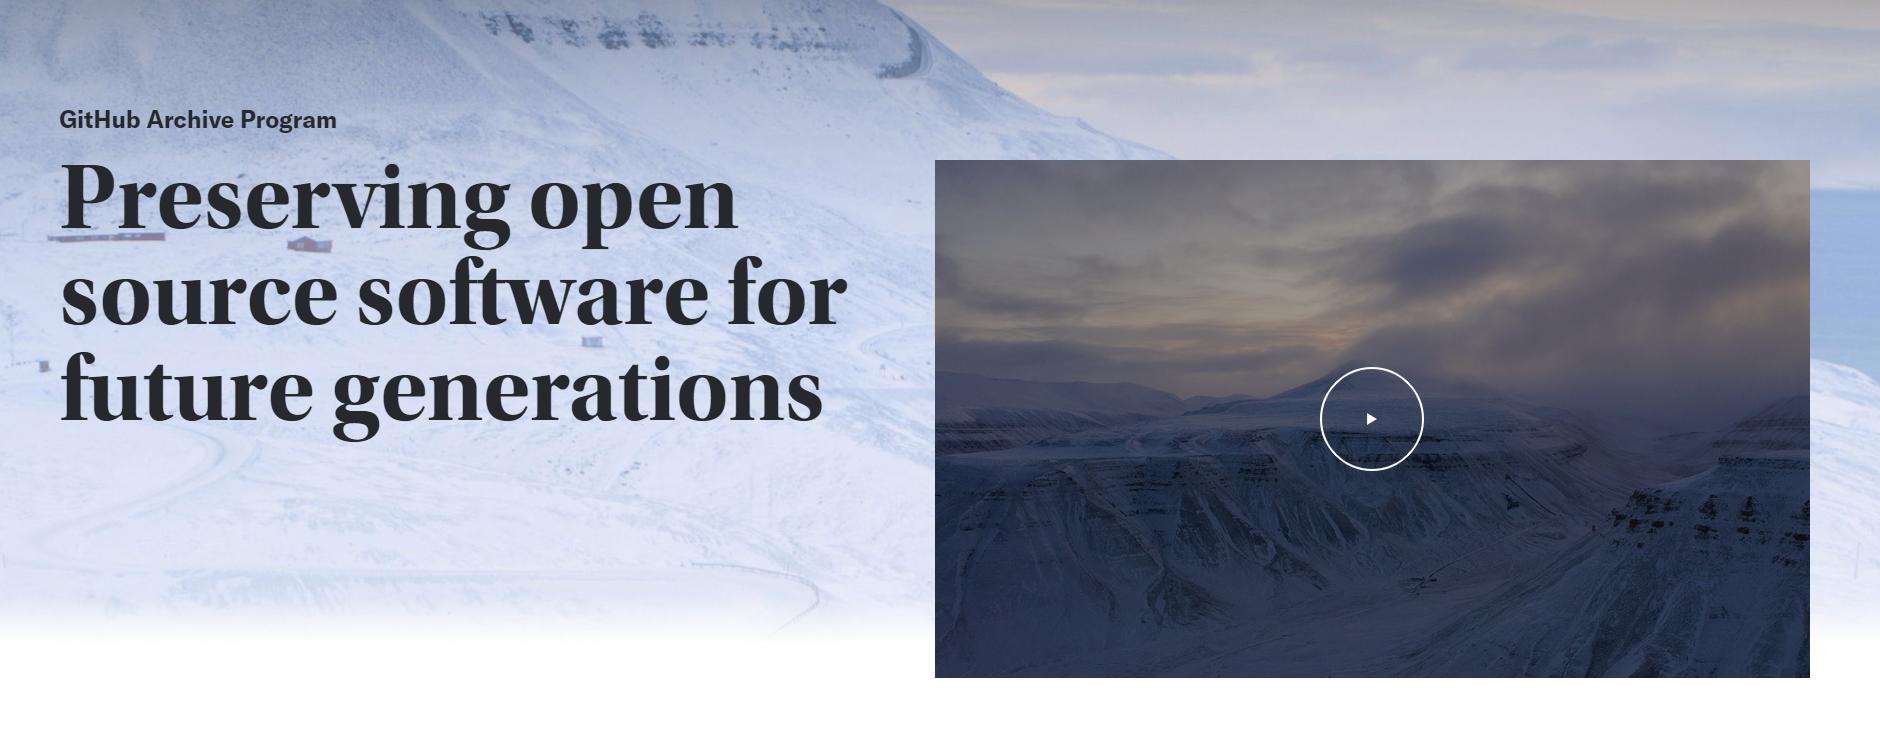 你的GitHub代码已成功入驻北极圈,至少保存1000年